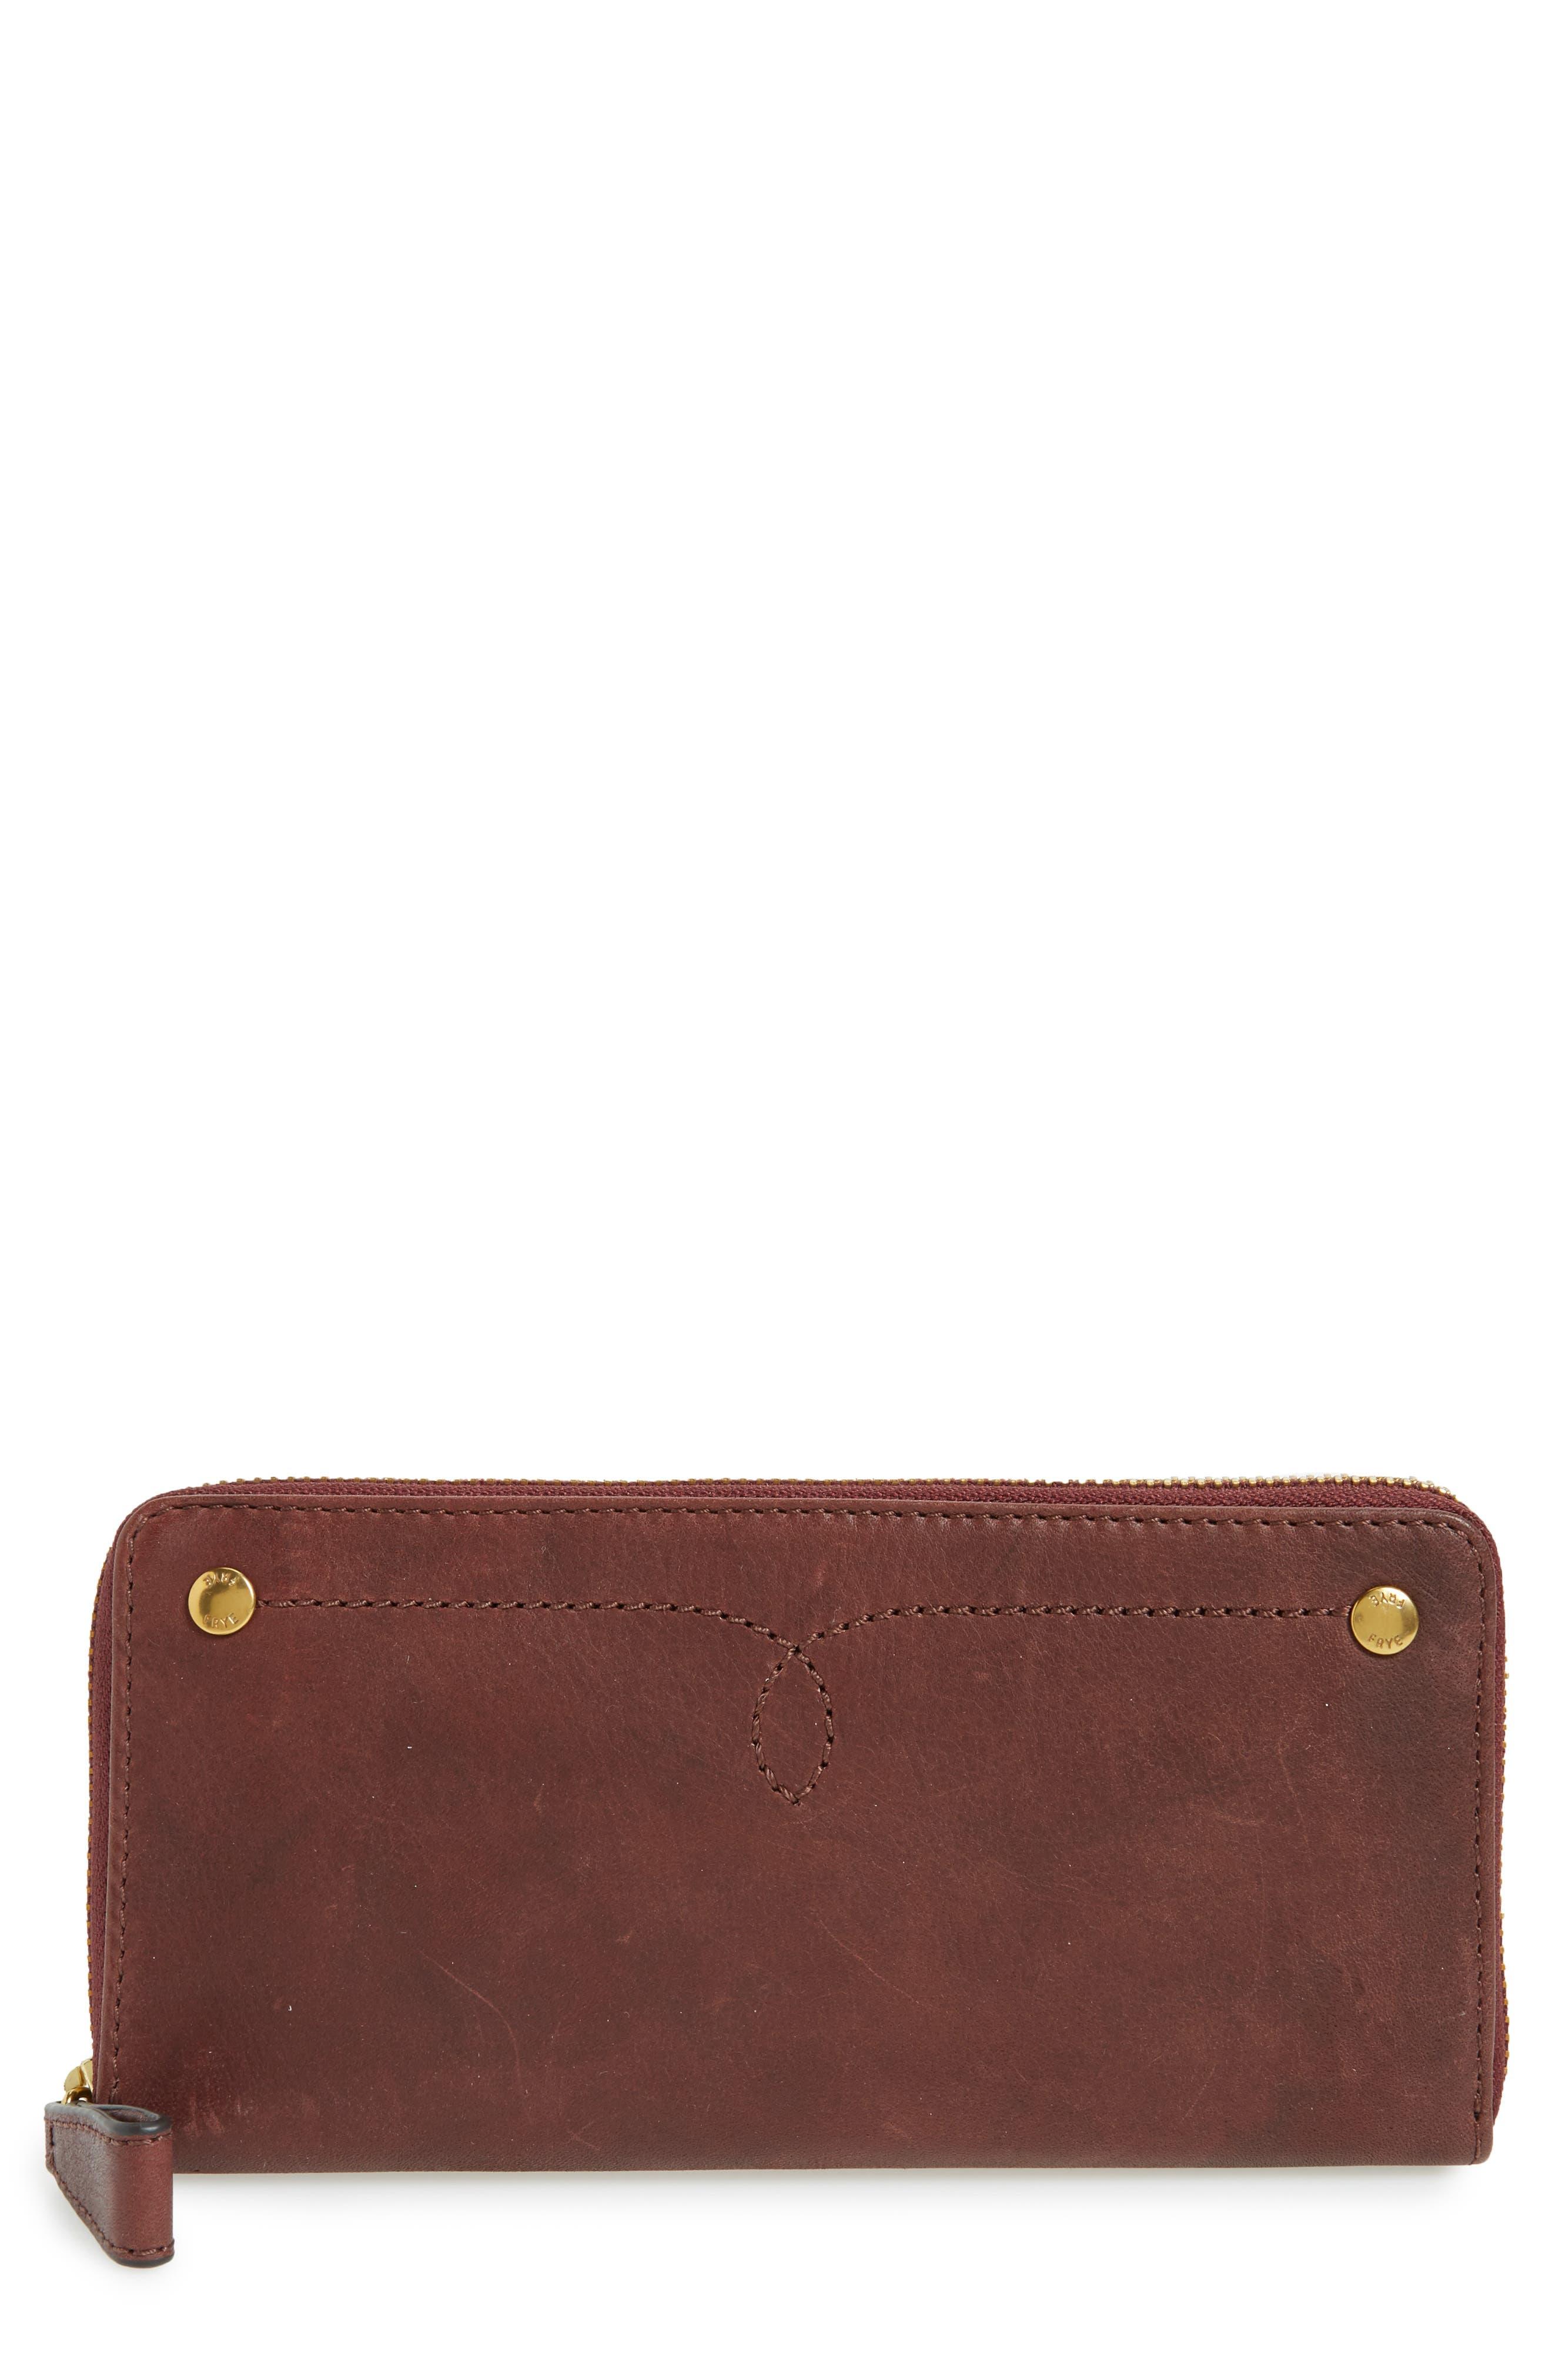 Campus Rivet Leather Continental Zip Wallet,                         Main,                         color,